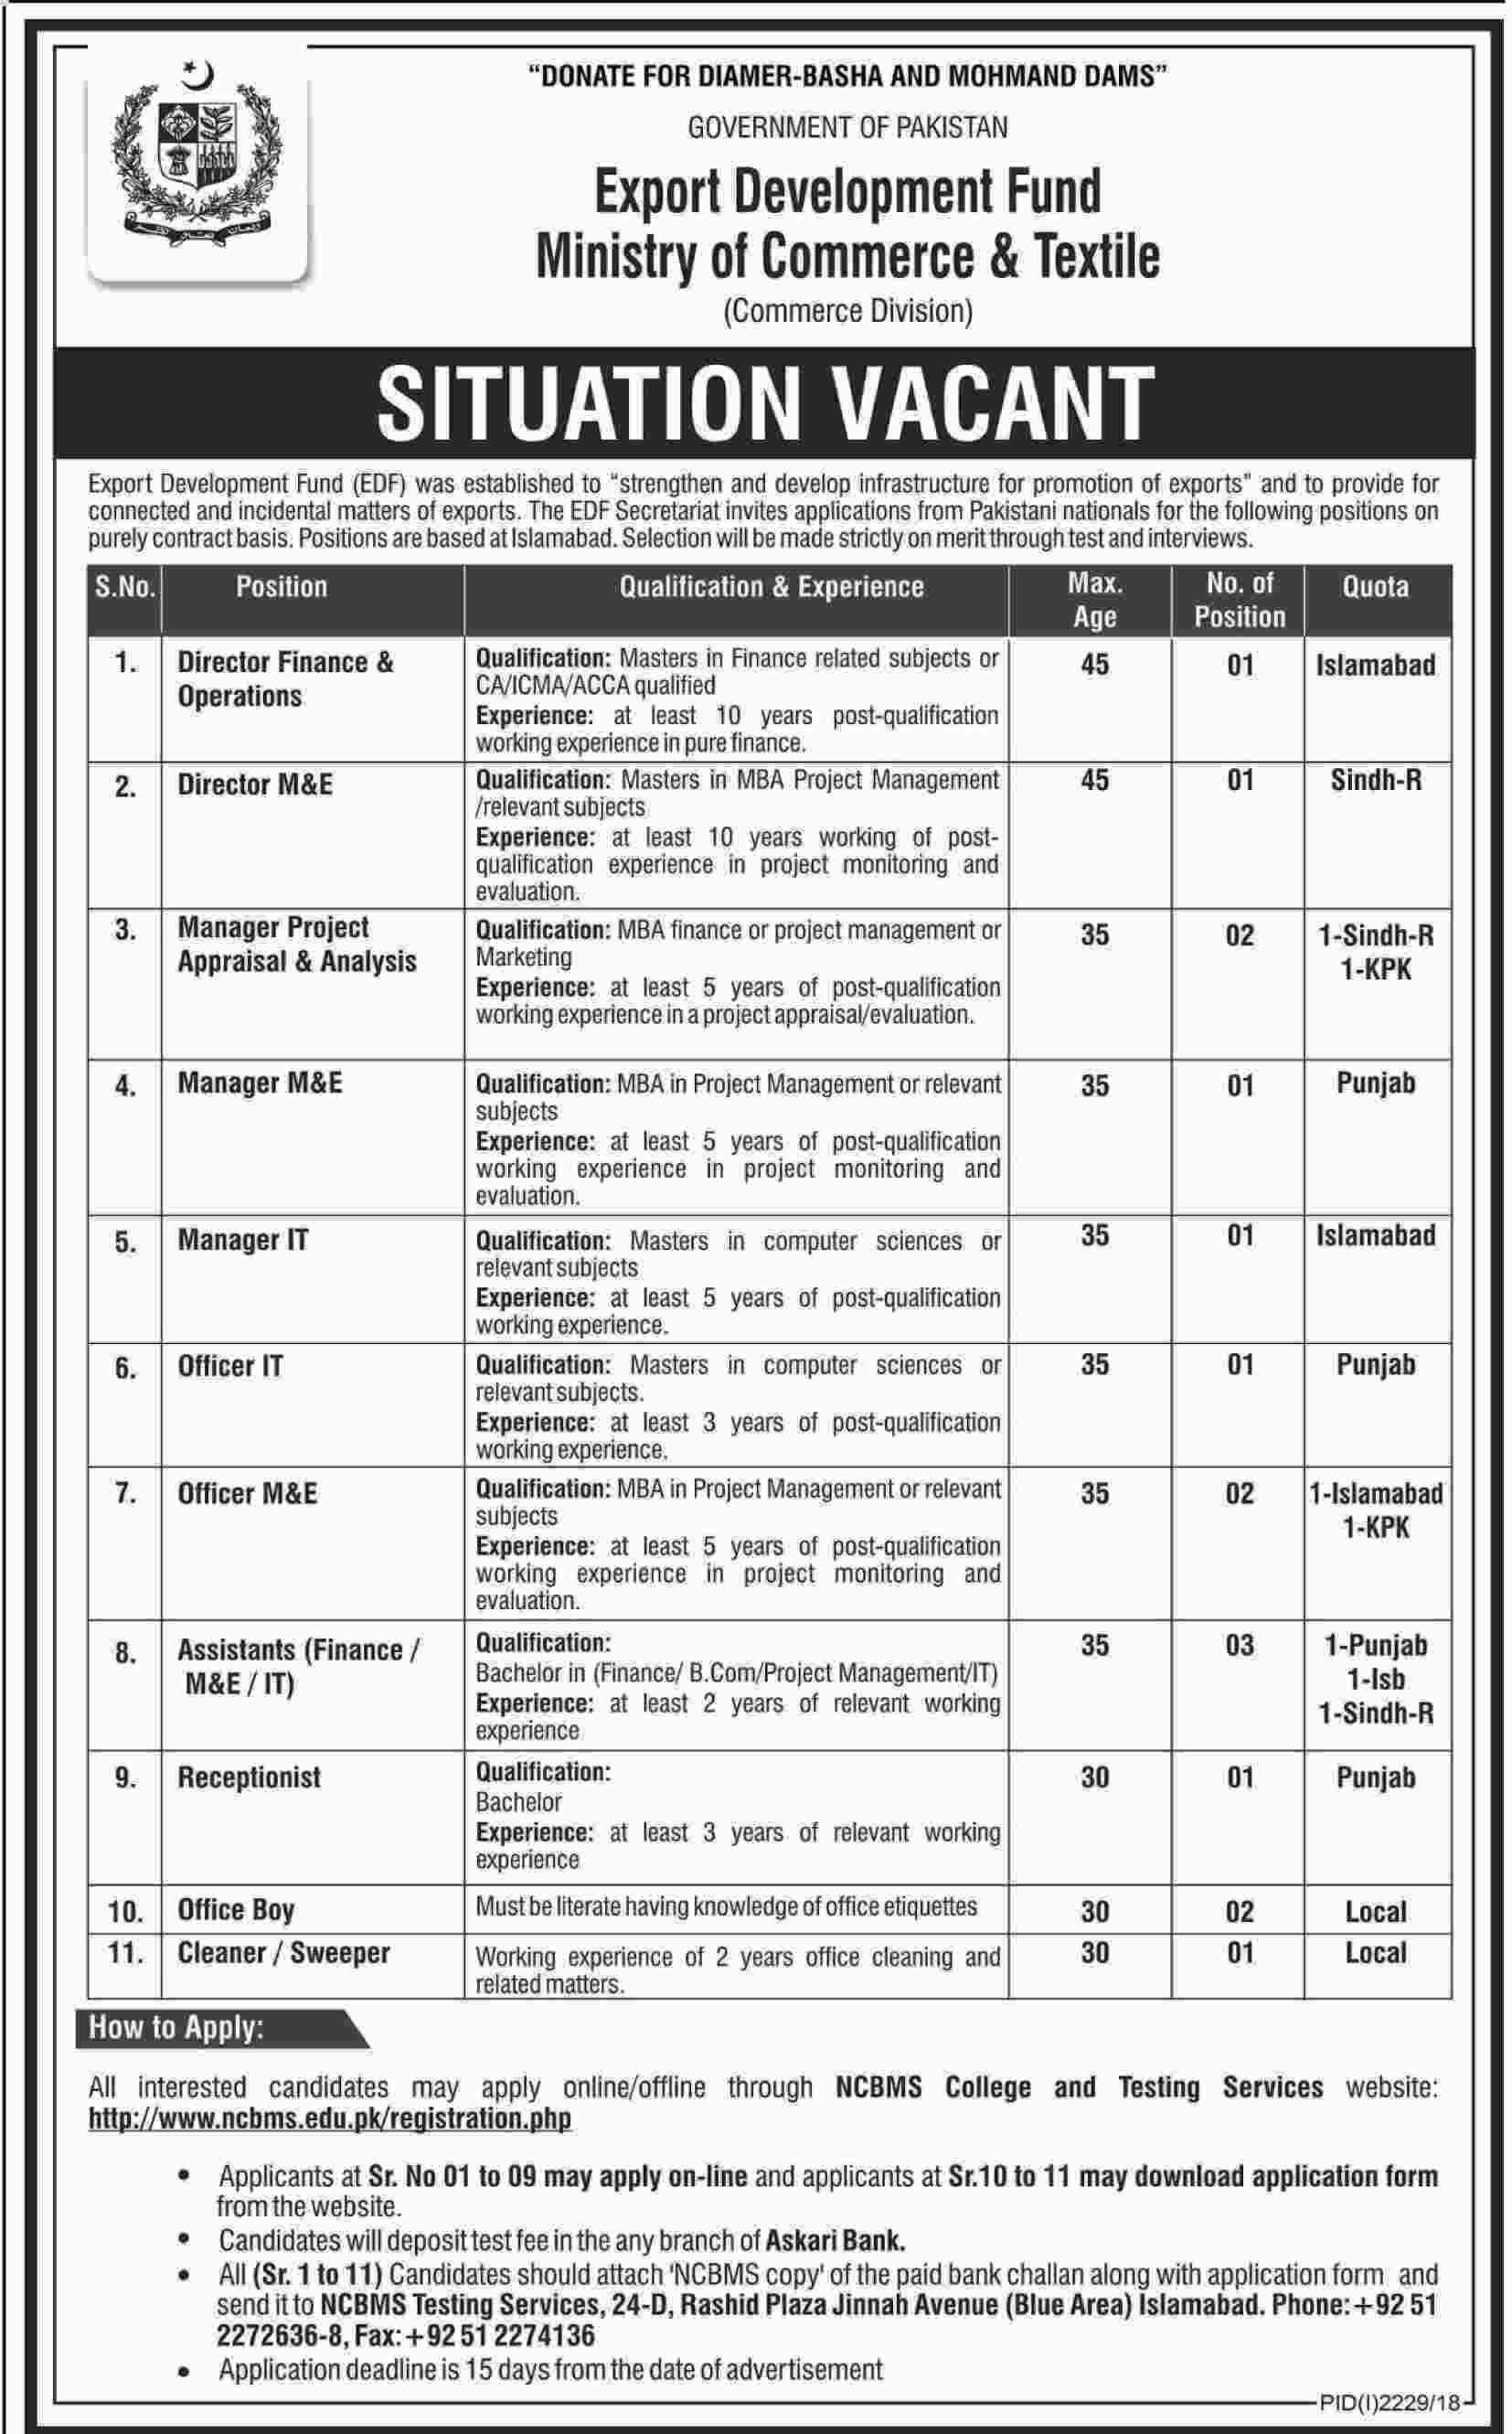 GOVERNMENT OF PAKISTAN , Export Development Fund - Jobs